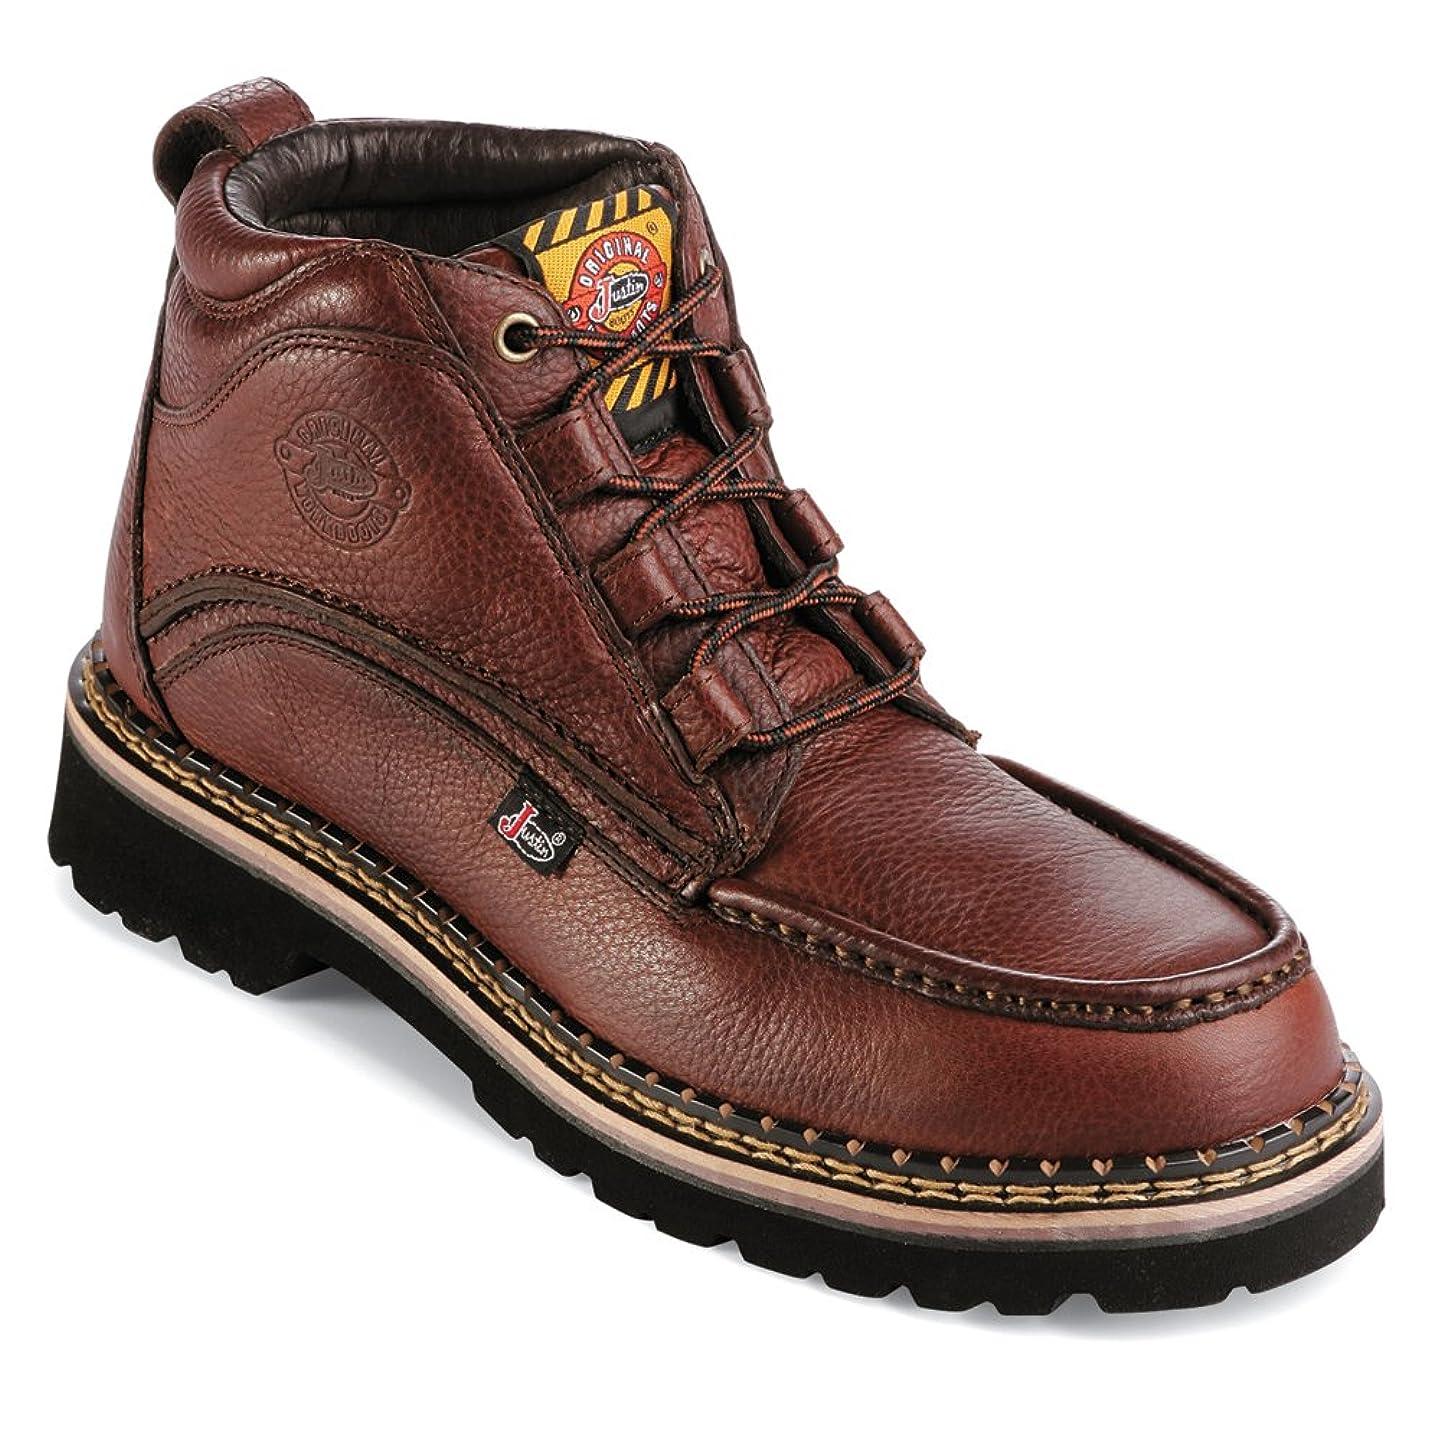 Justin Original Workboots Style WK900 Men's Boots